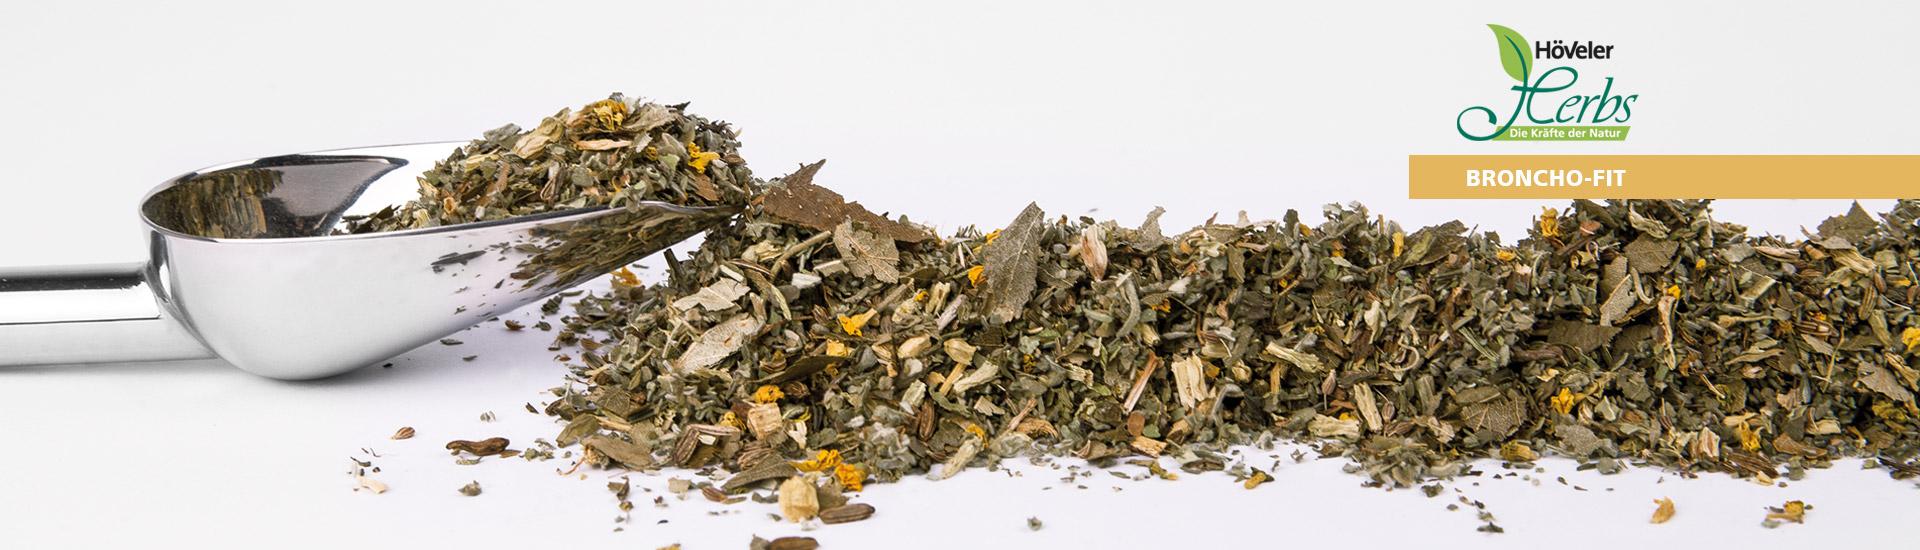 Höveler Herbs - Broncho-Fit